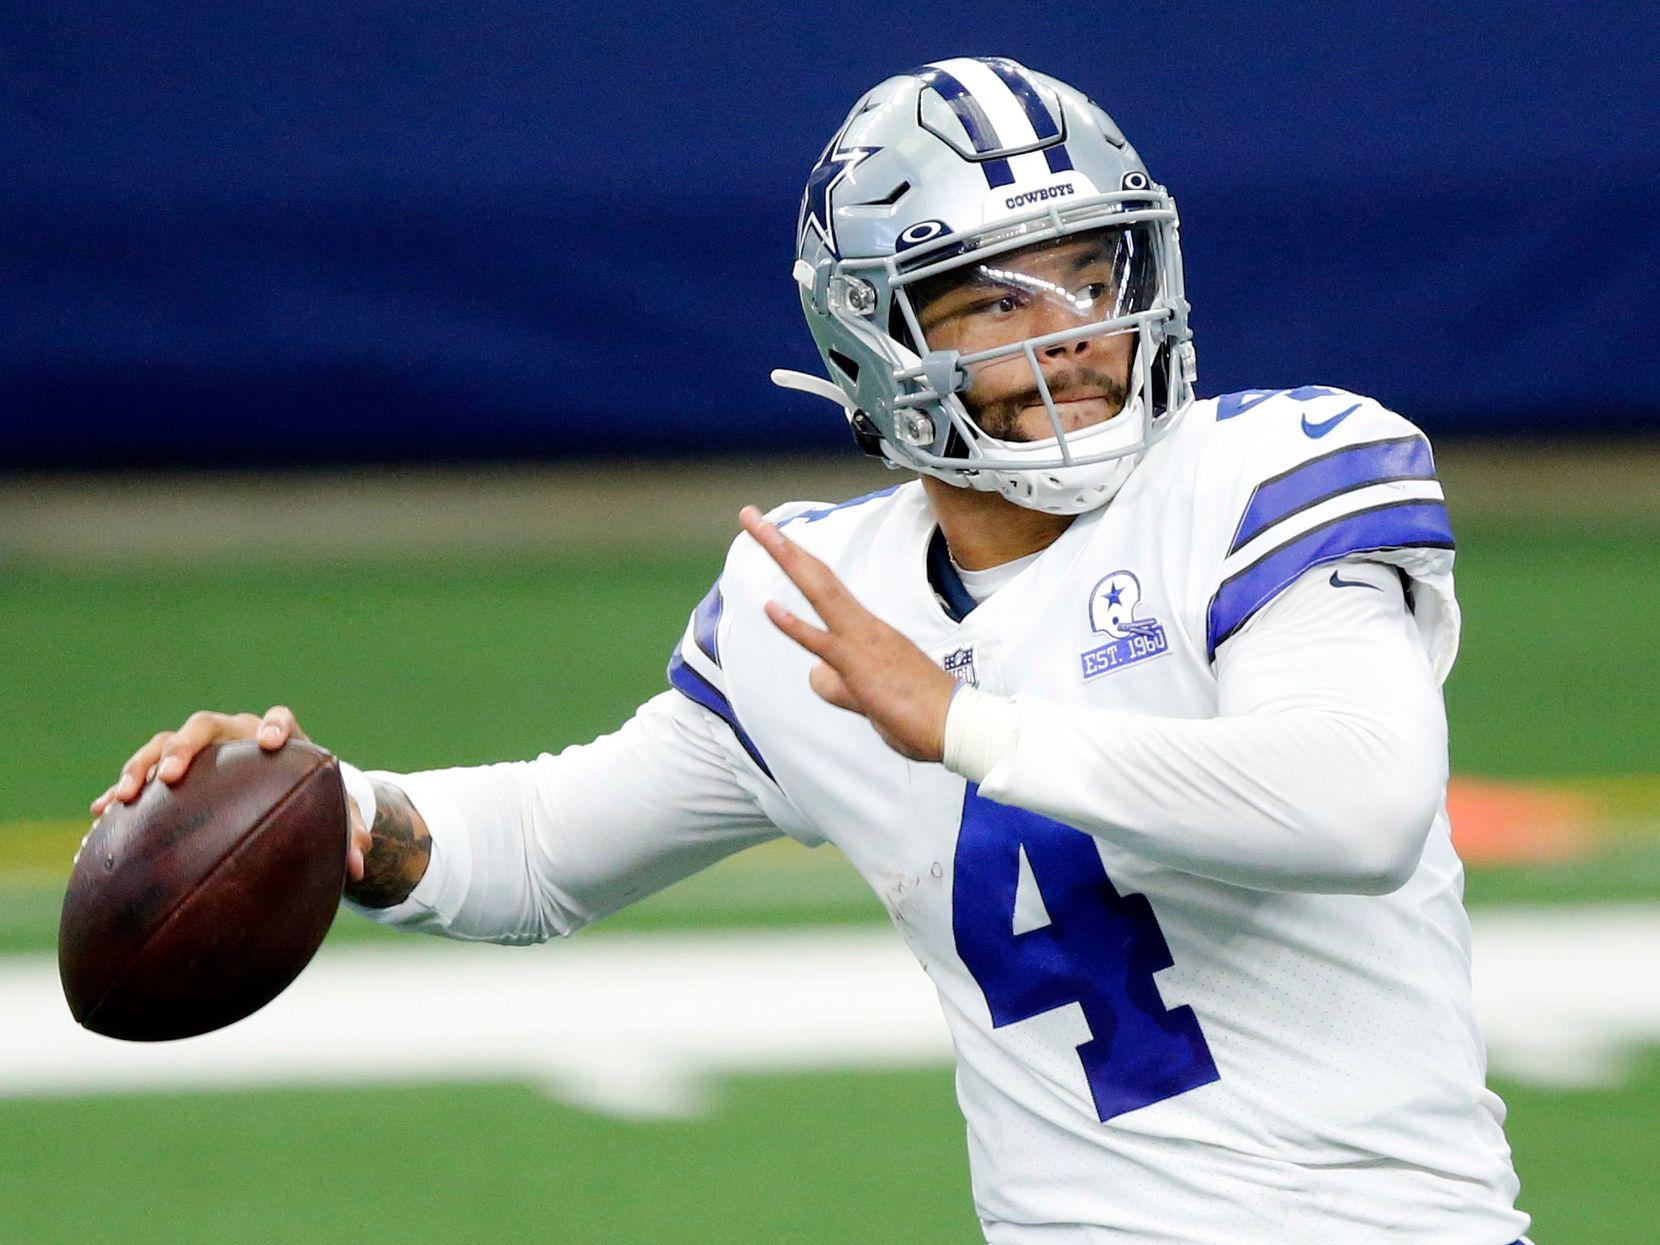 Dallas Cowboys quarterback Dak Prescott (4) throws a fourth quarter pass against the Cleveland Browns at AT&T Stadium in Arlington, Texas, Sunday, October 4, 2020. (Tom Fox/The Dallas Morning News)